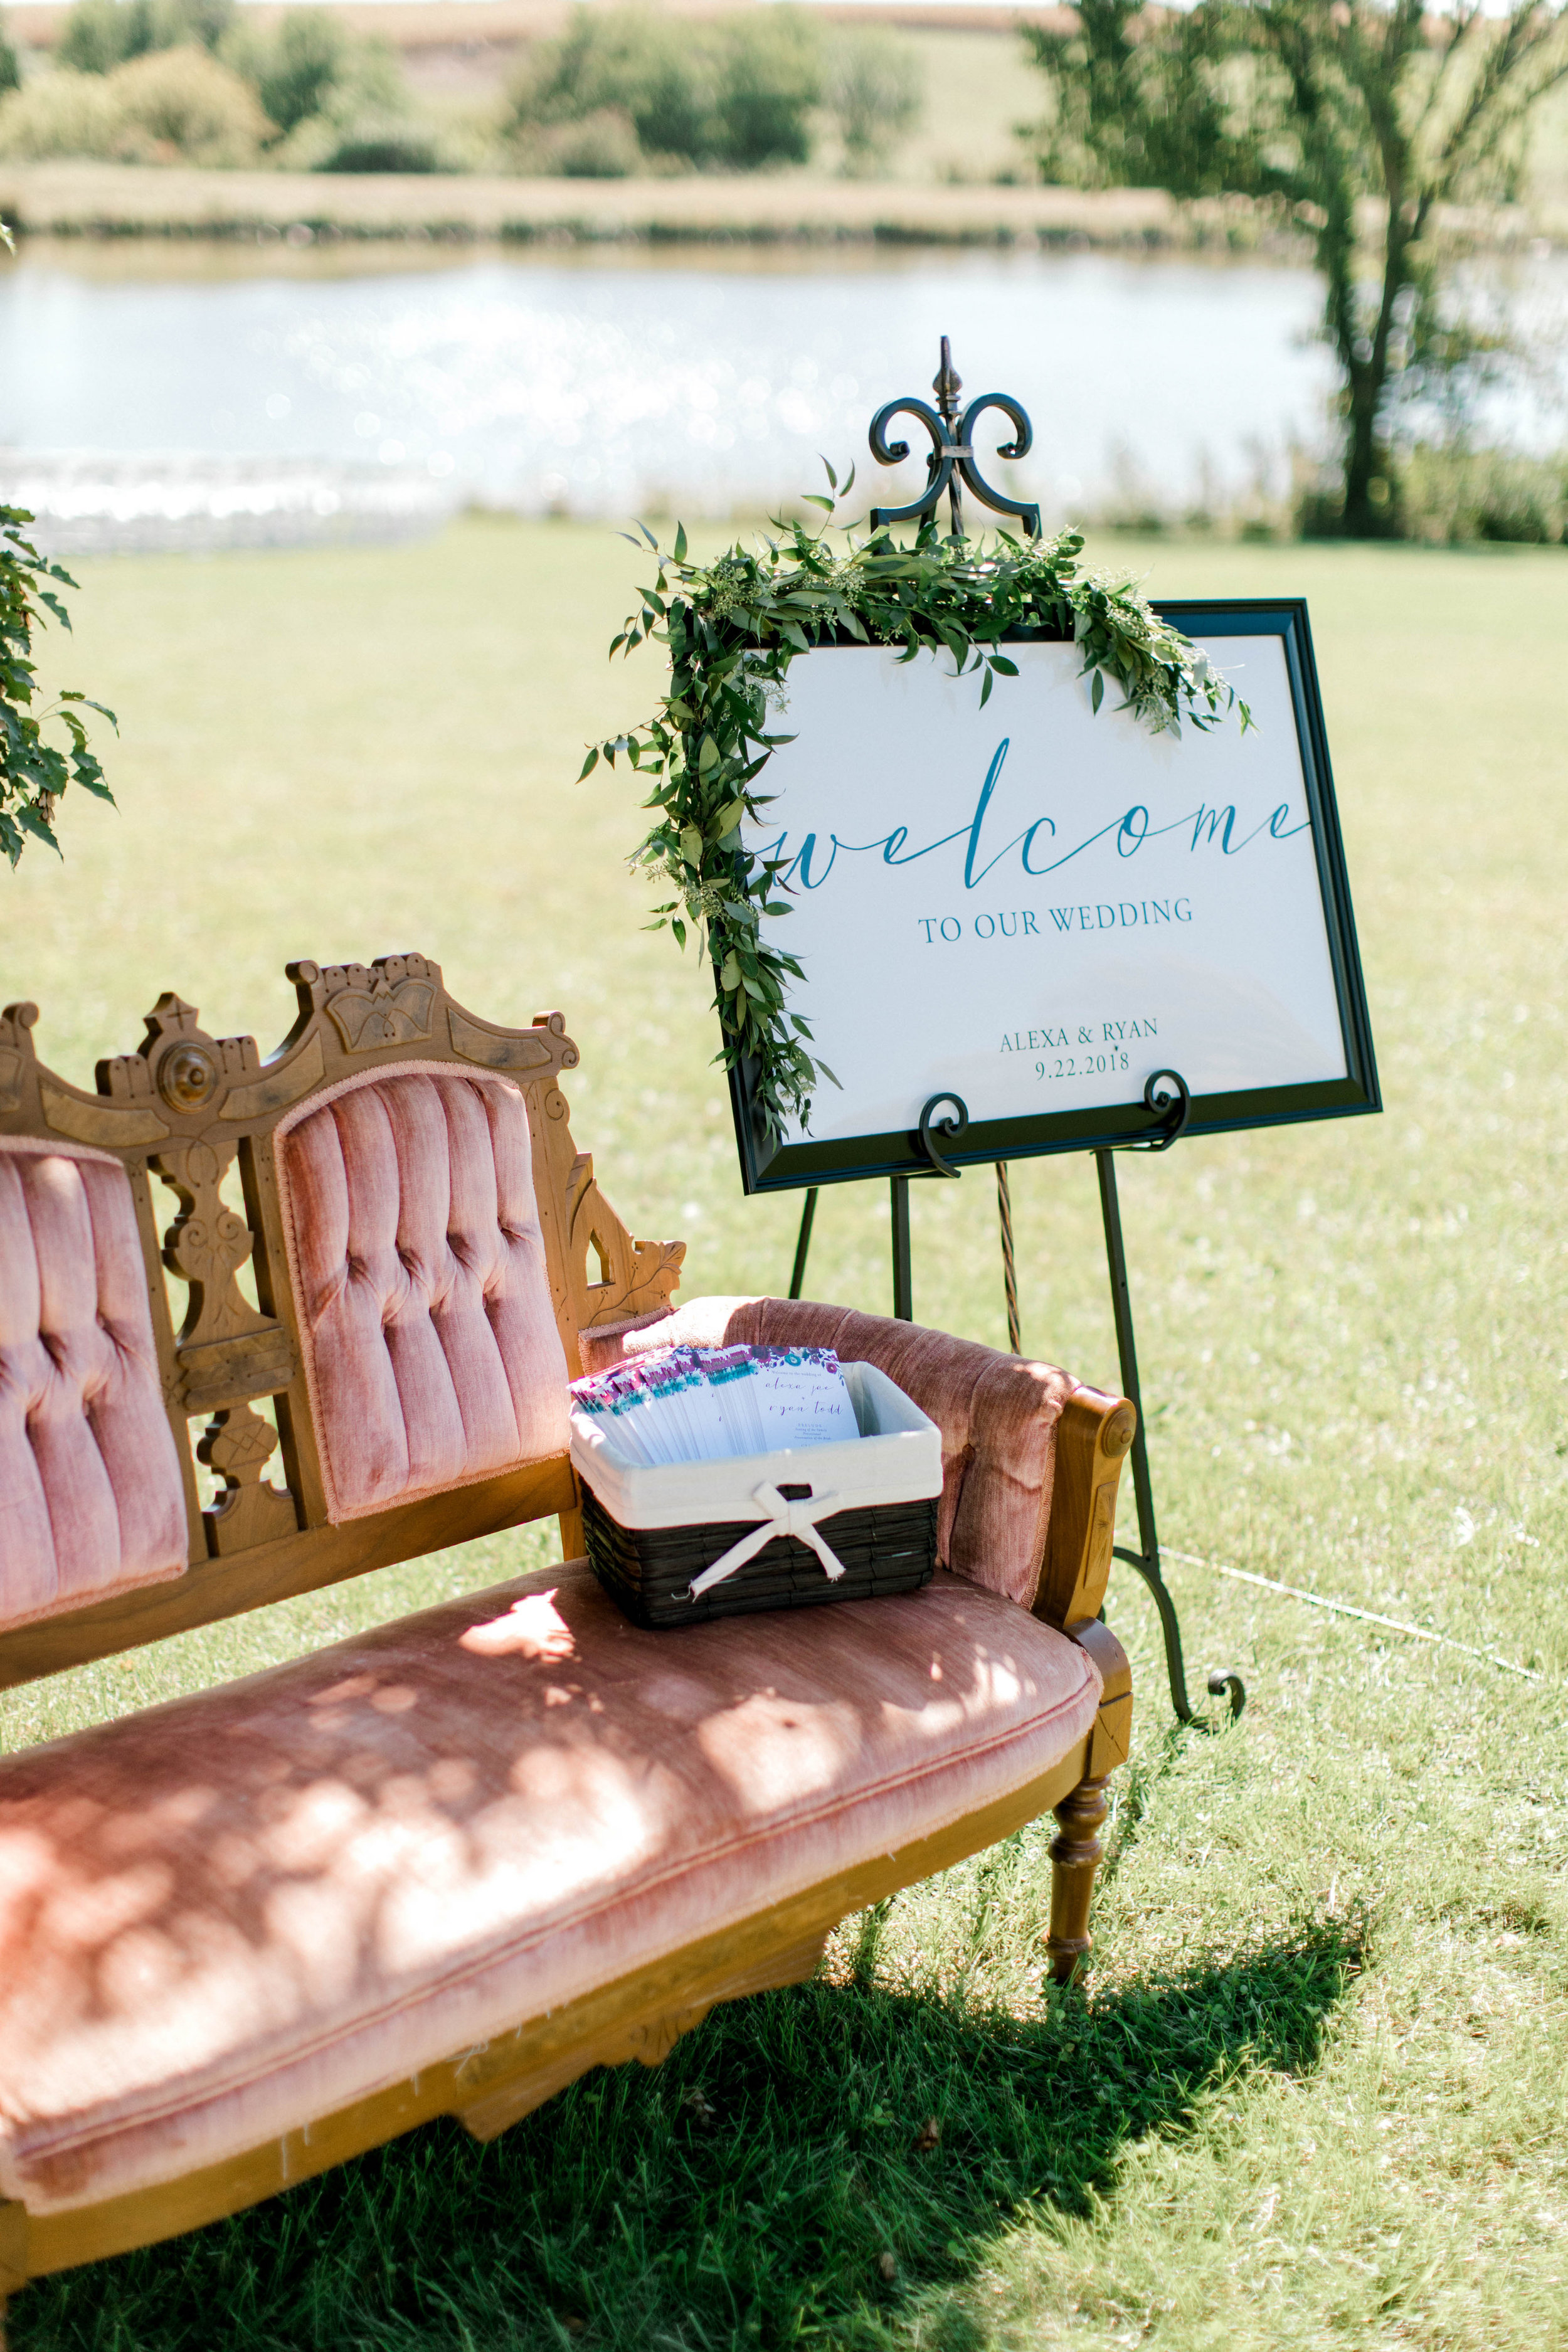 Ryan Alexa Married-Formals Ceremony-0083.jpg